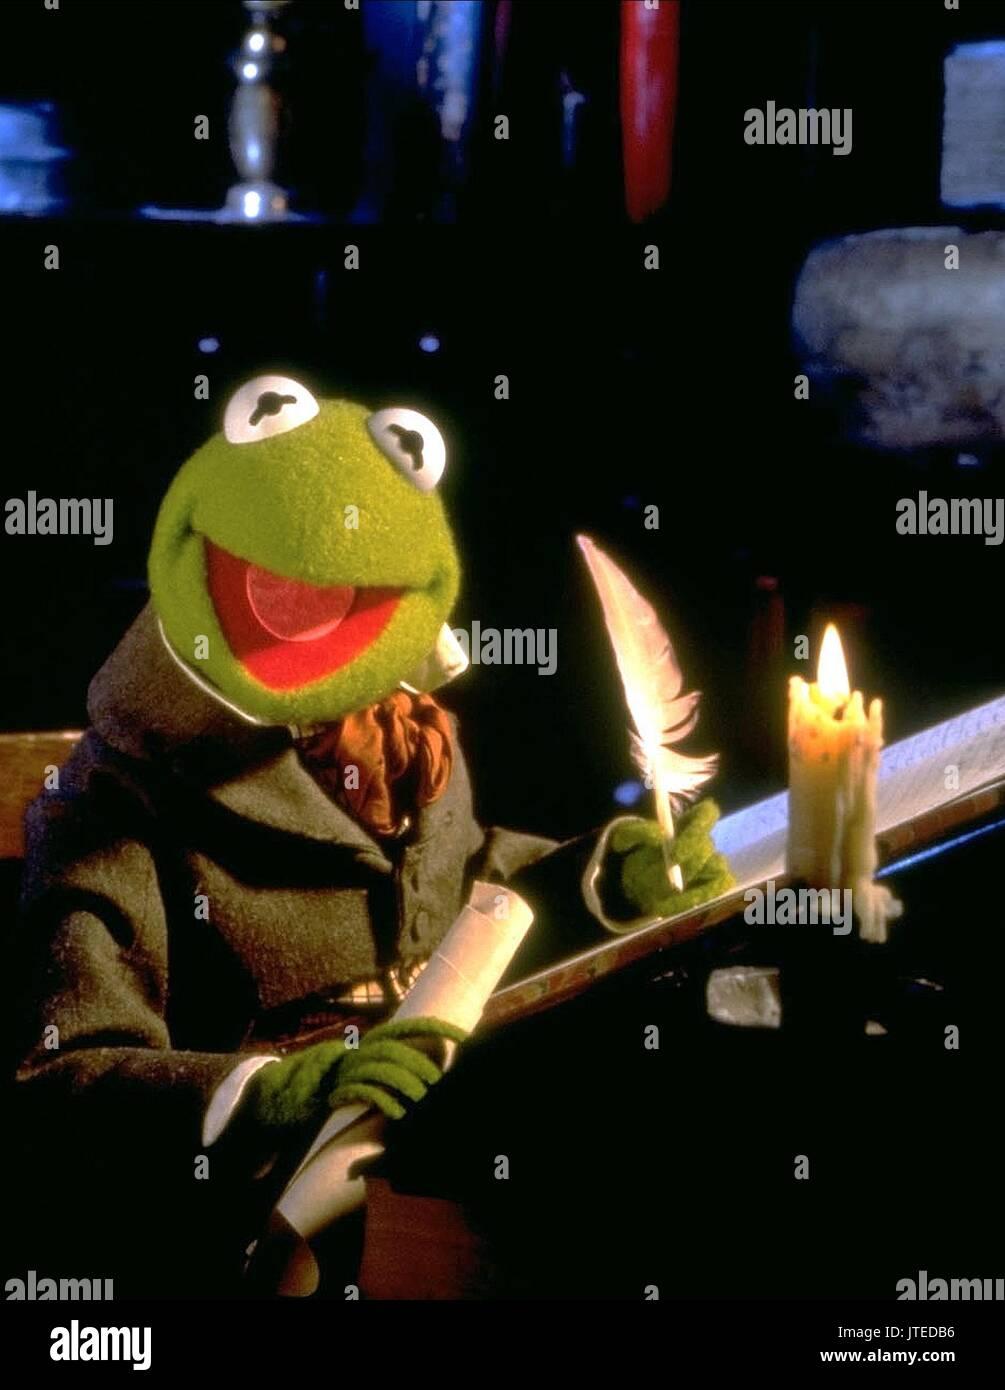 Kermit Frog Christmas Stock Photos & Kermit Frog Christmas Stock ...